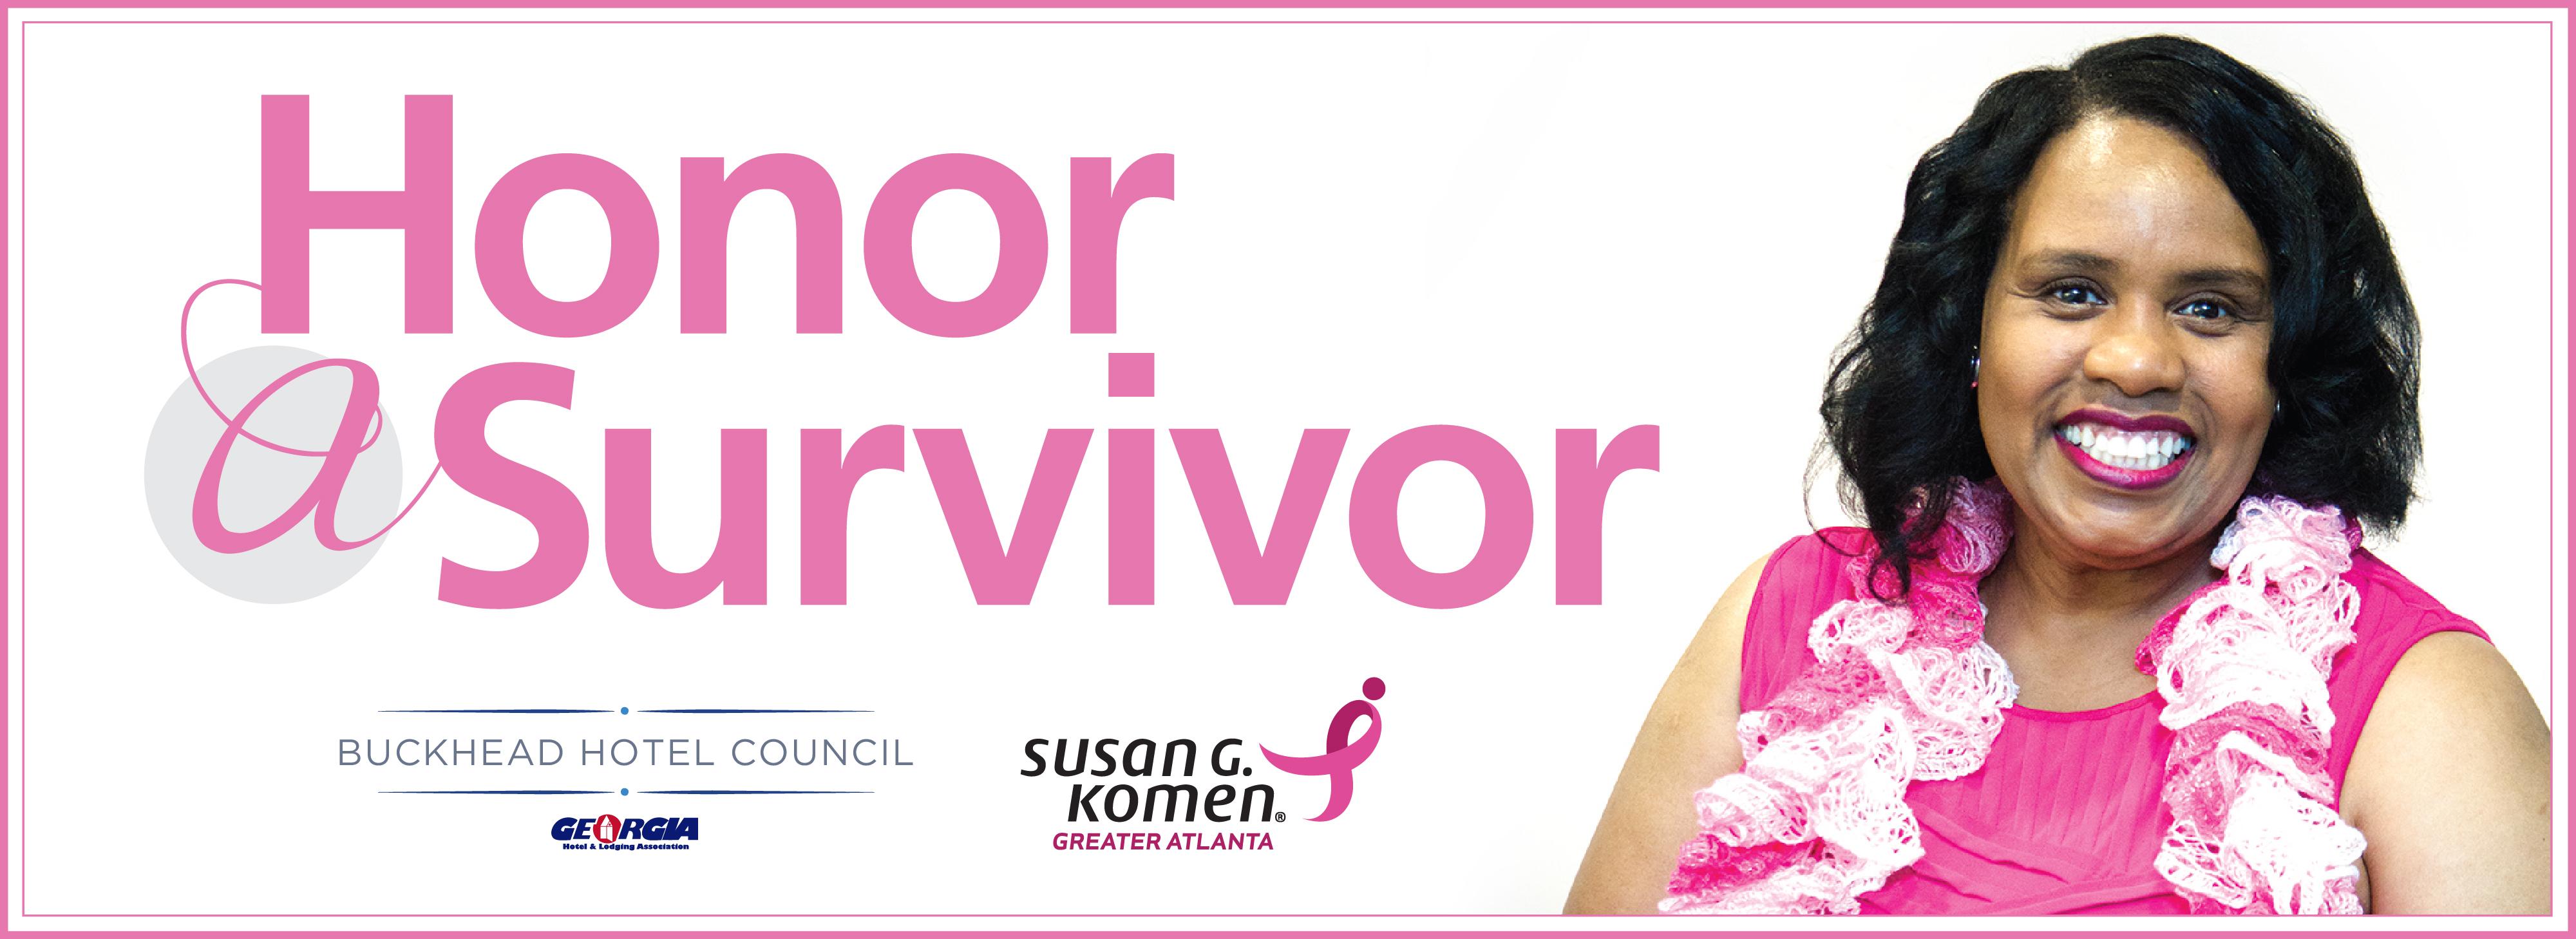 Honor-a-Survivor-Slide